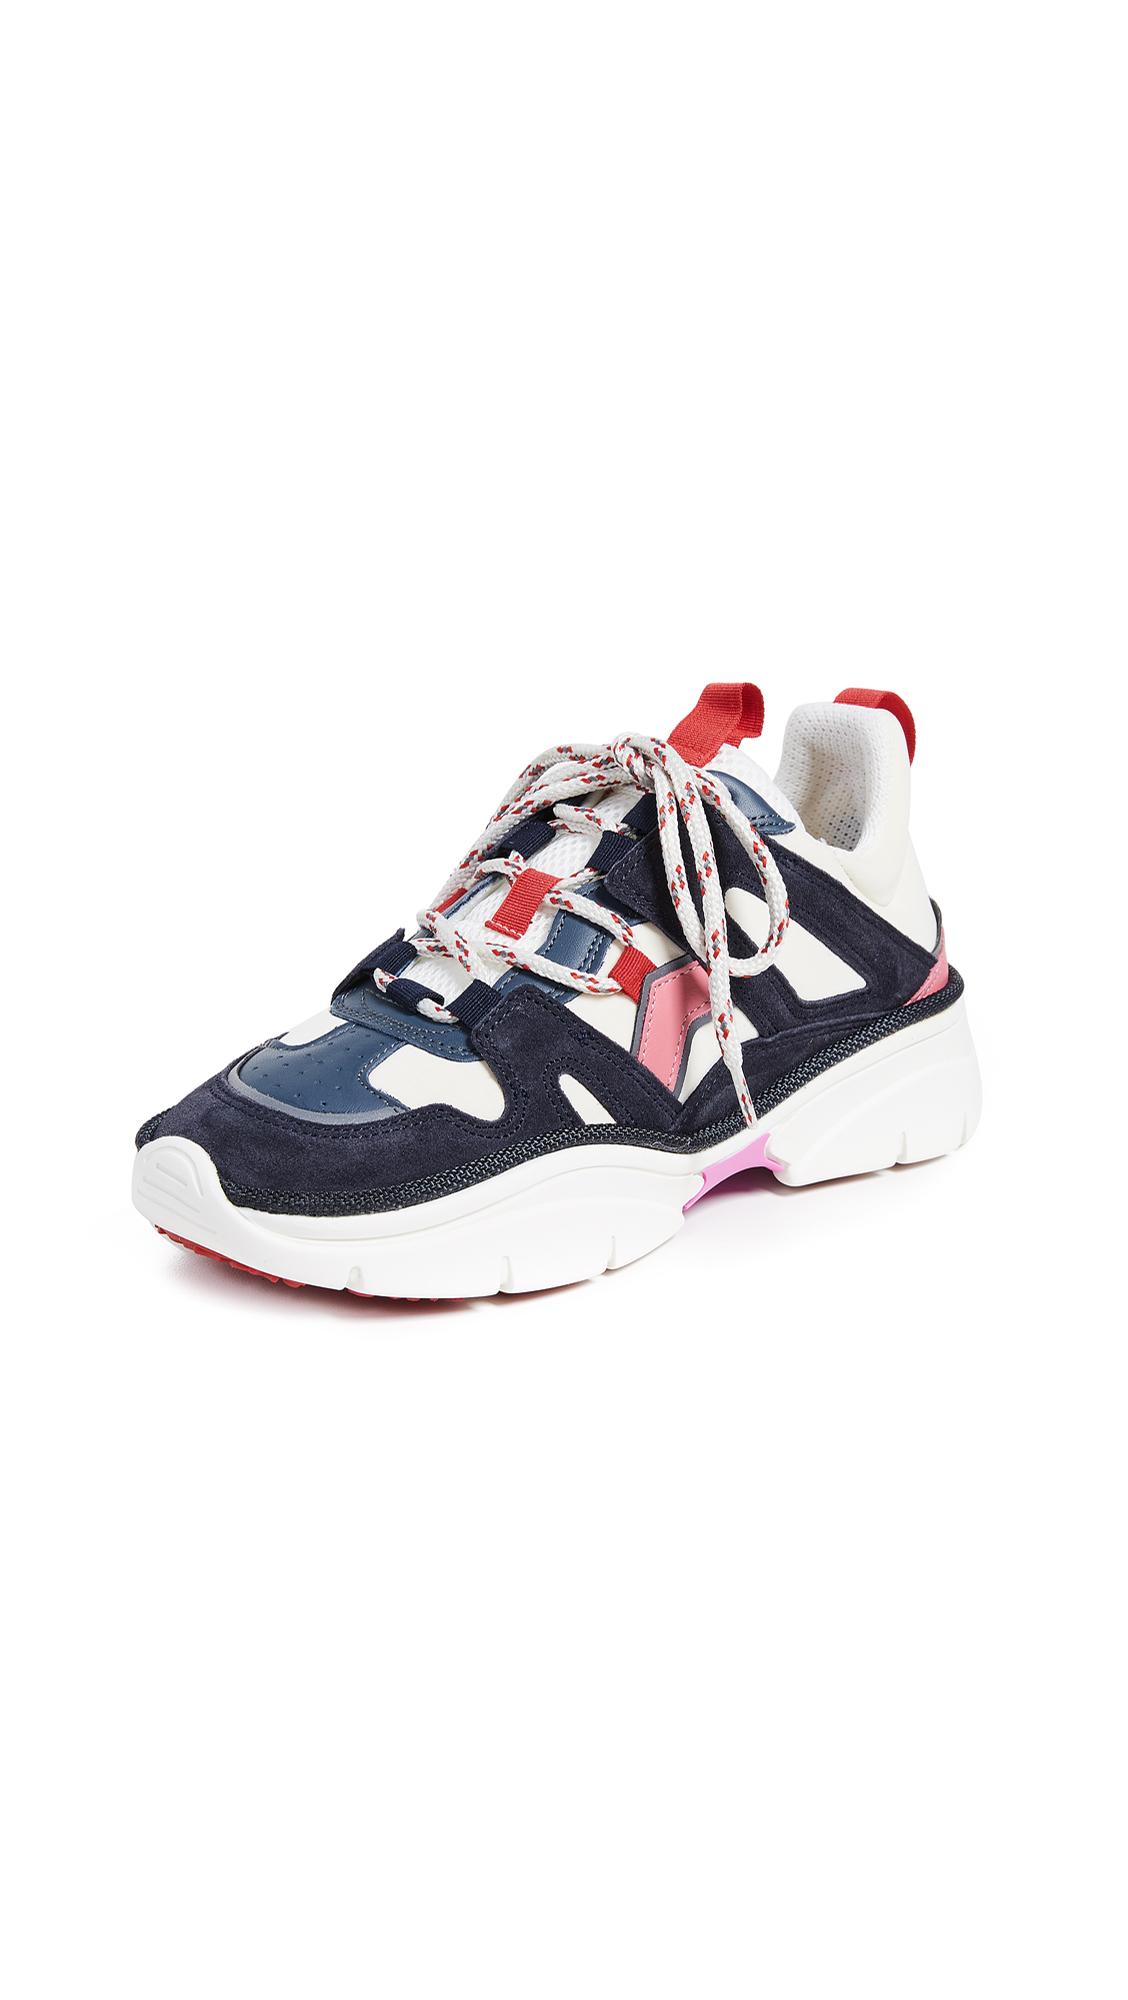 Isabel Marant Kindsay Sneakers - Ecru Blue